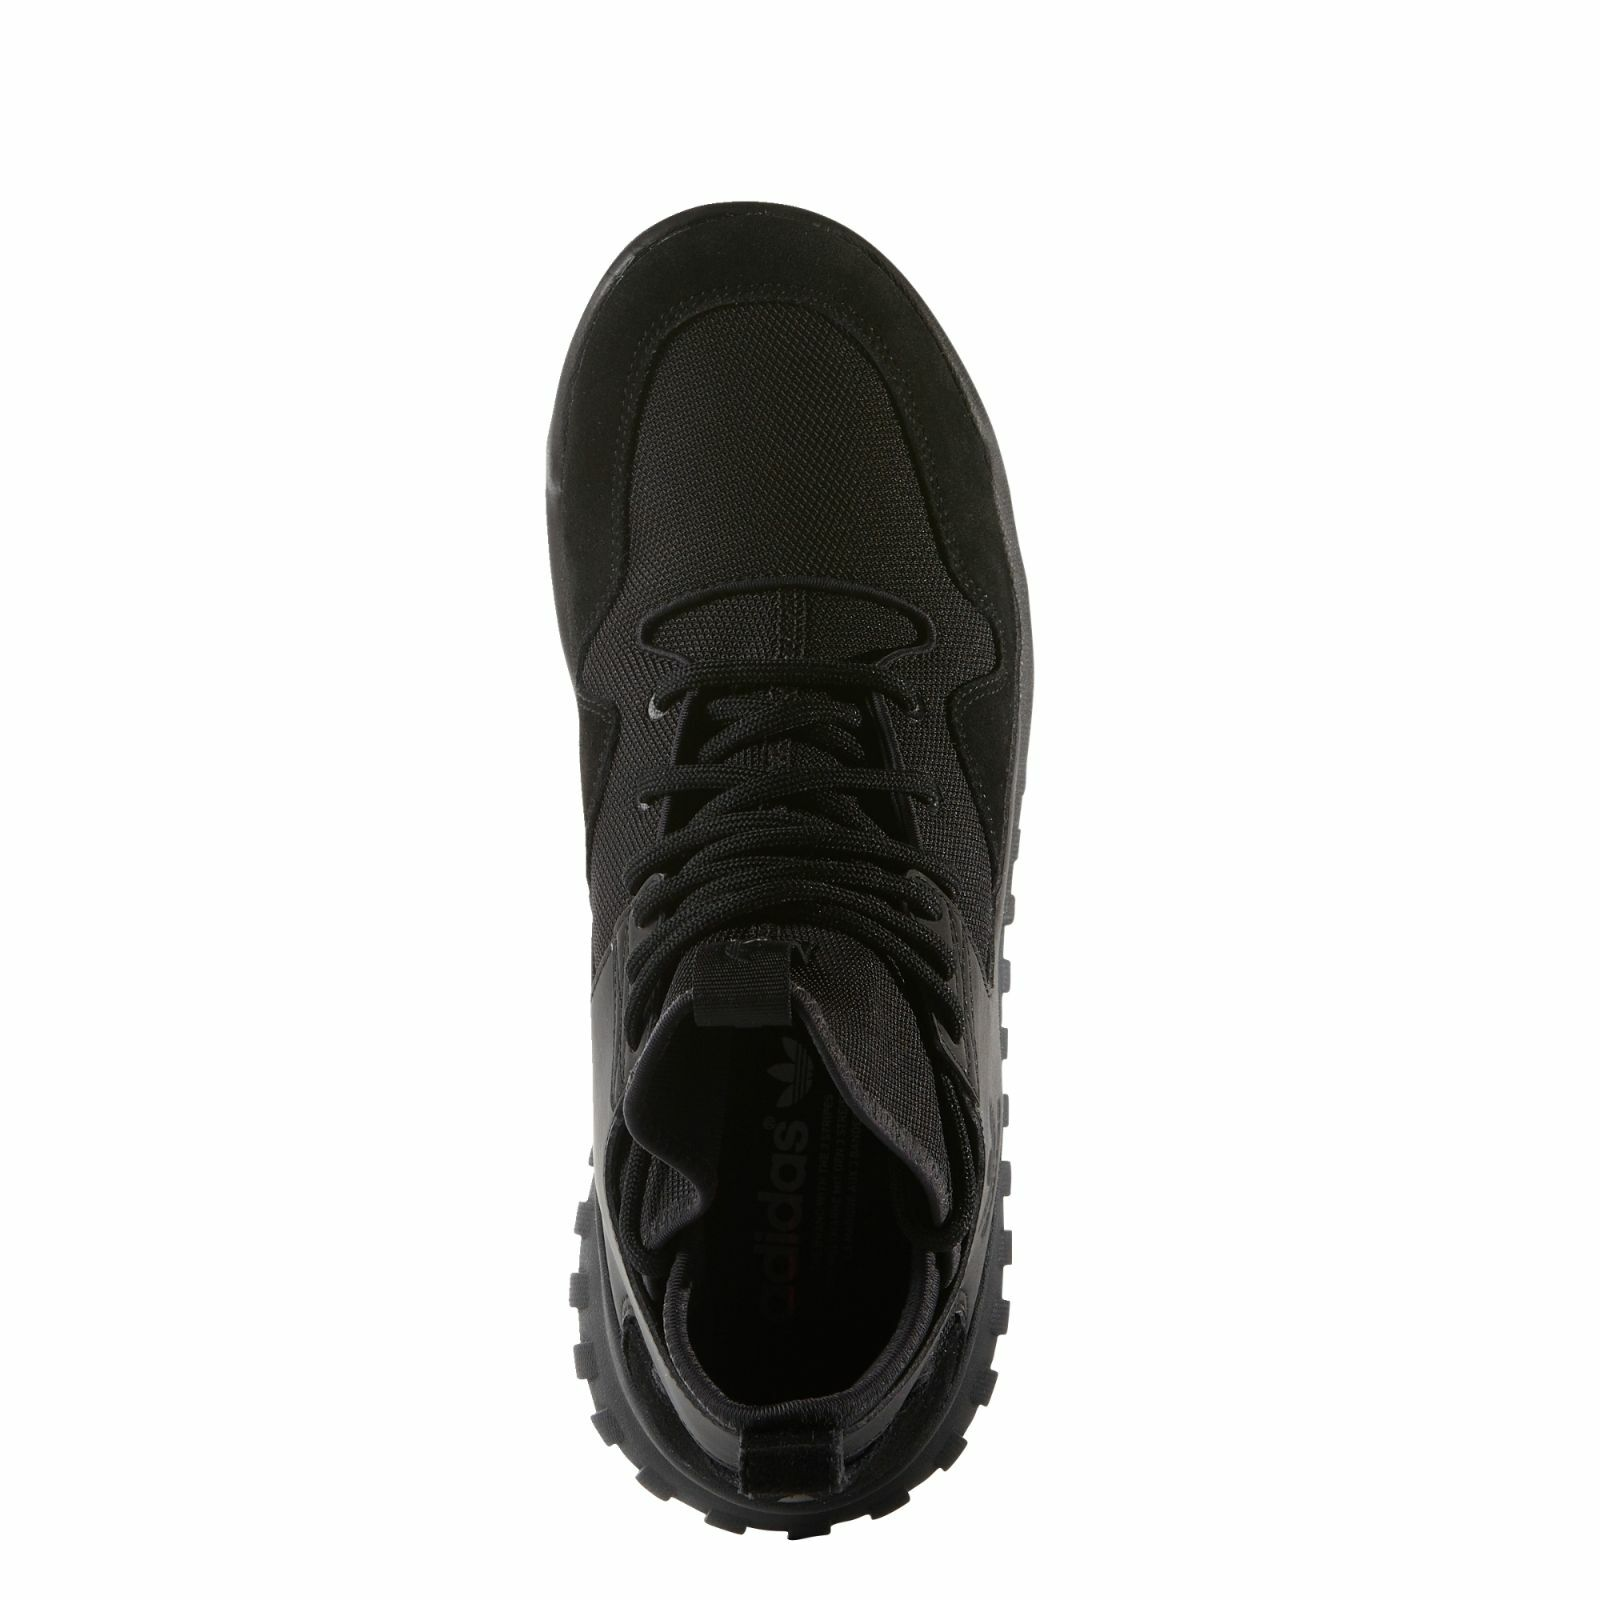 adidas Originals TUBULAR X PK S74922 CBLACK/CBLACK Turnschuhe Primeknit NEU SALE